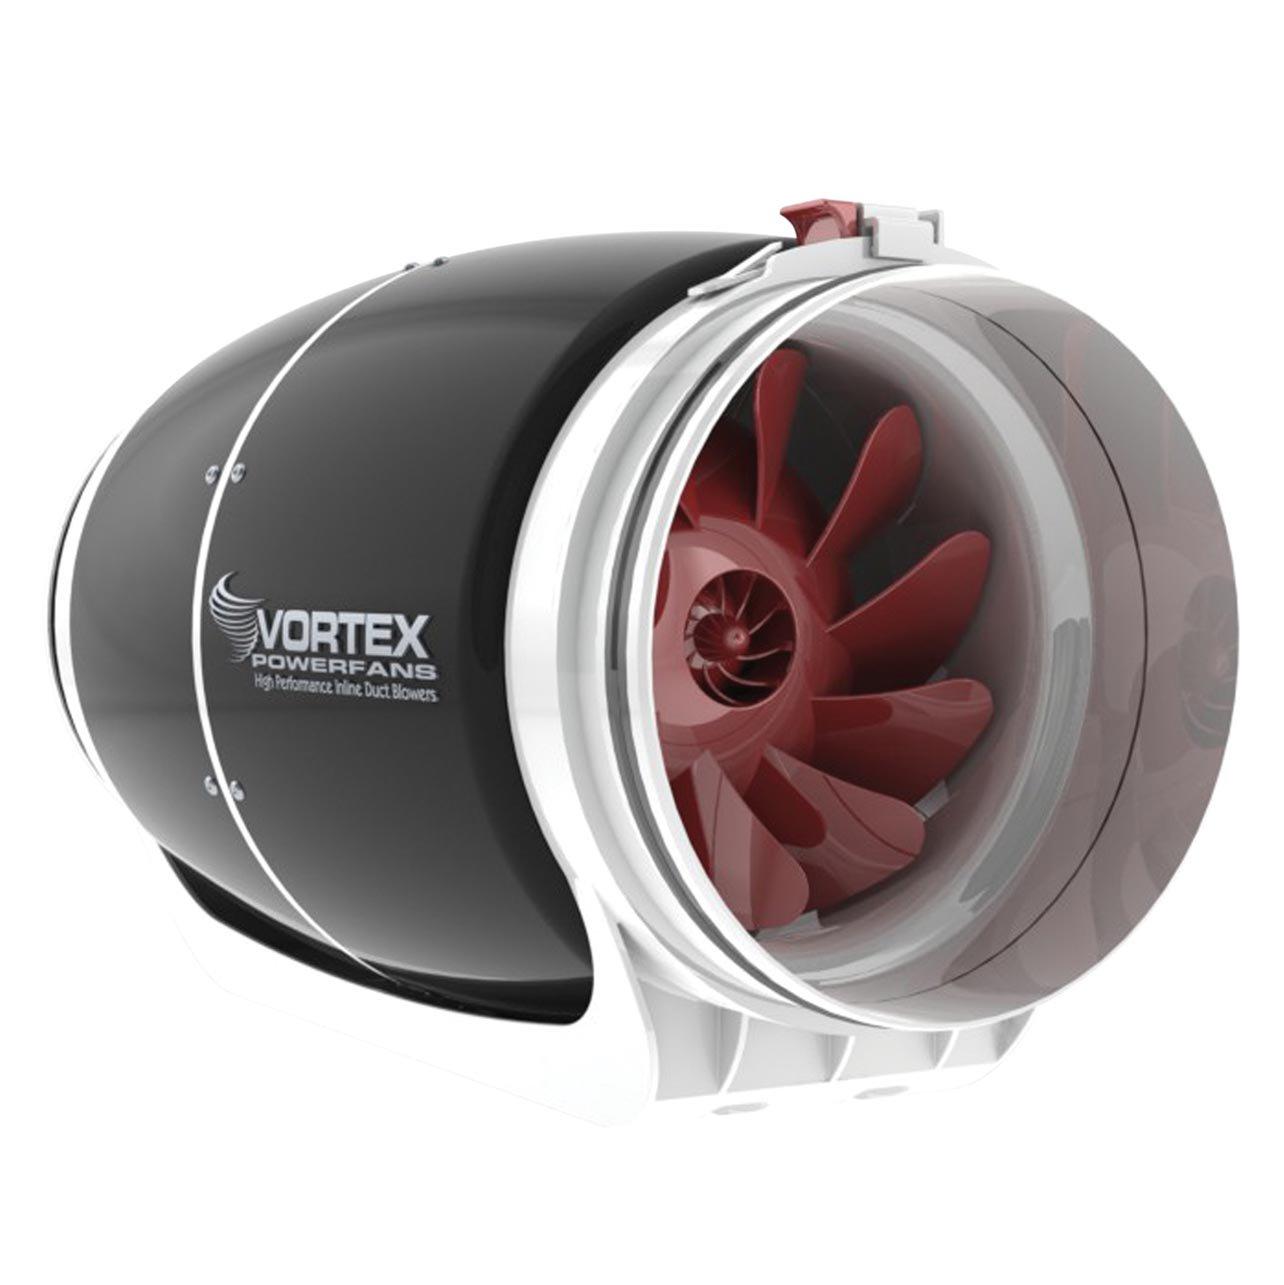 Vortex 8 Inch 728 CFM S Line Powerfan Inline Ventilation Duct Exhaust Blower Fan